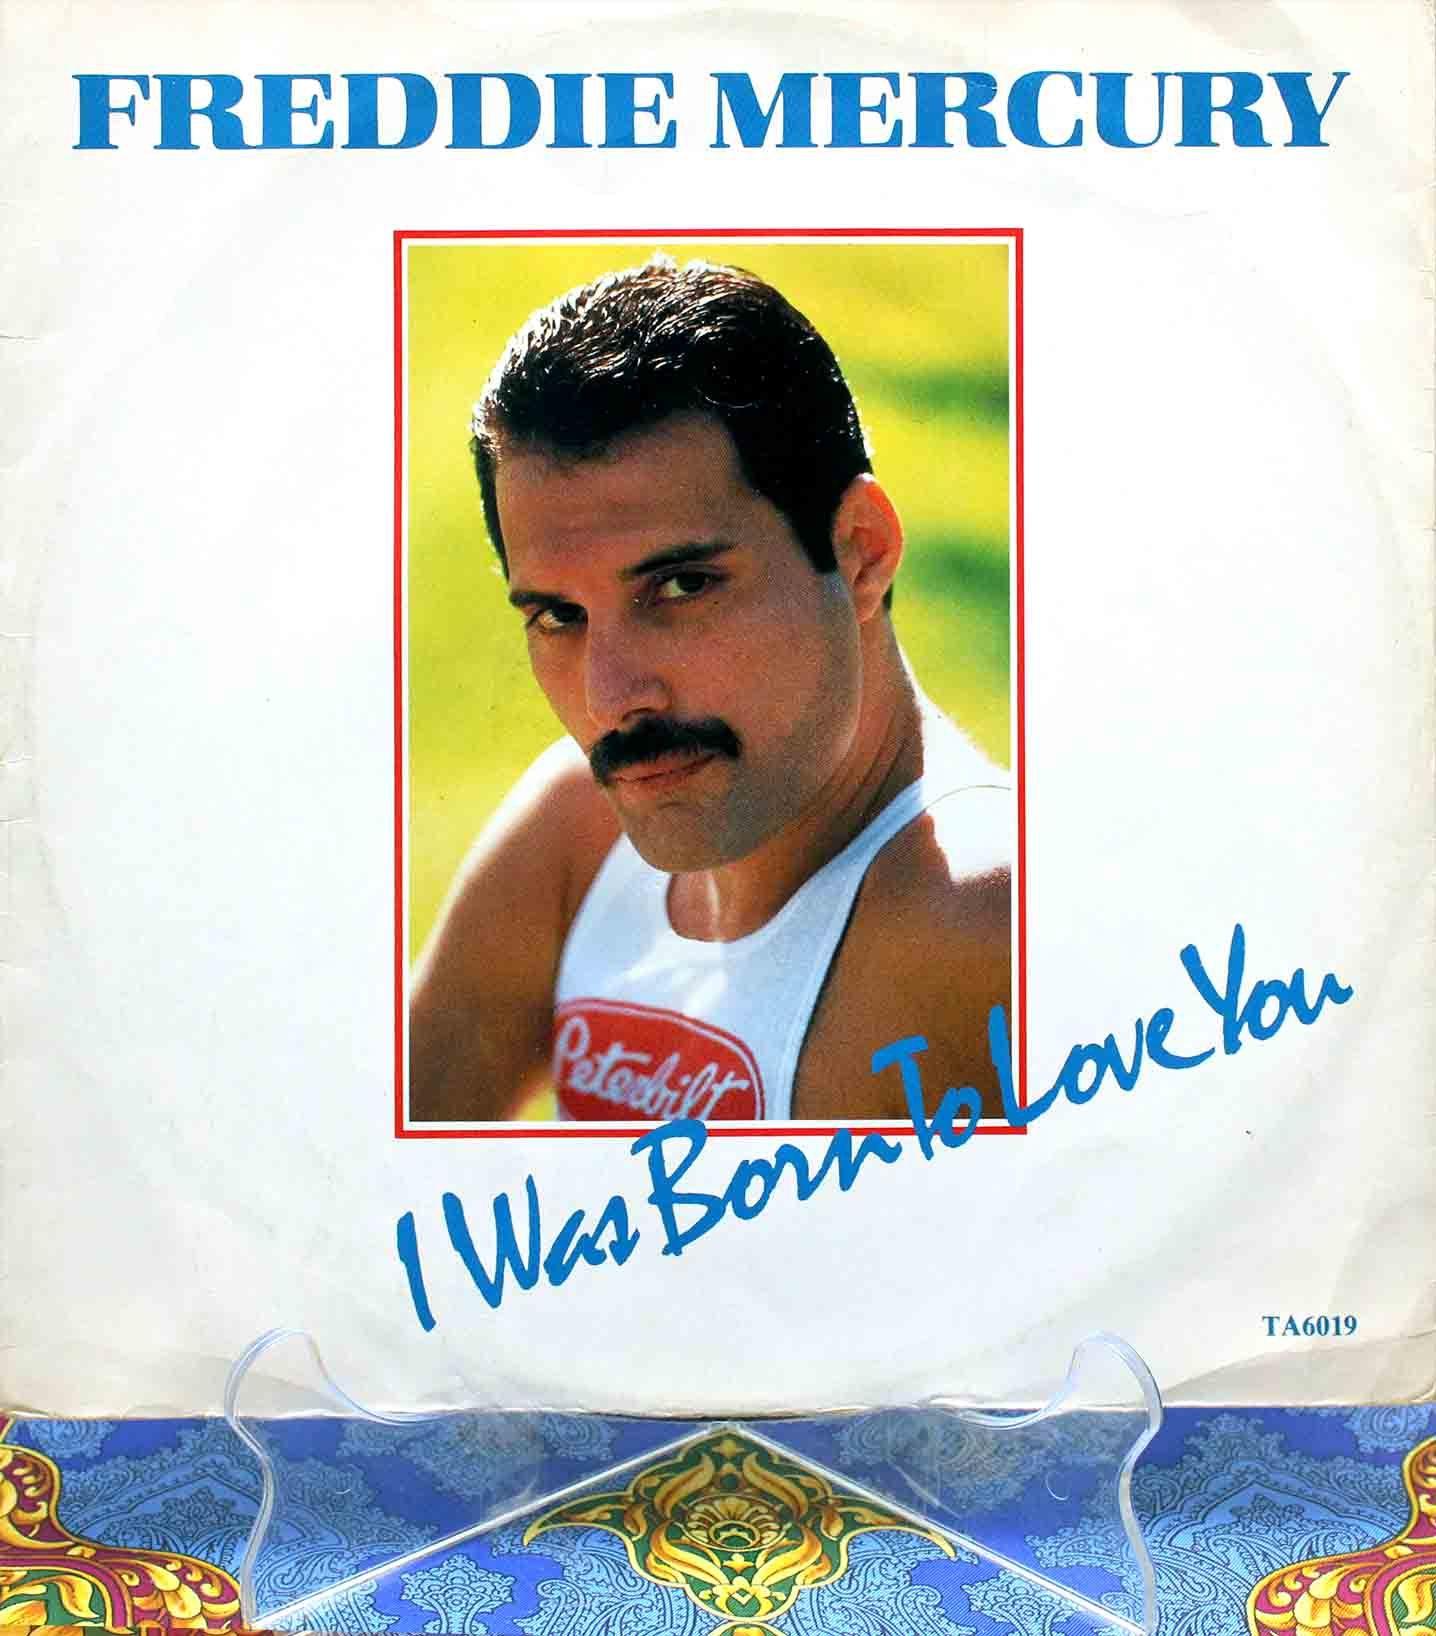 Freddie Mercury – I Was Born To Love You 01